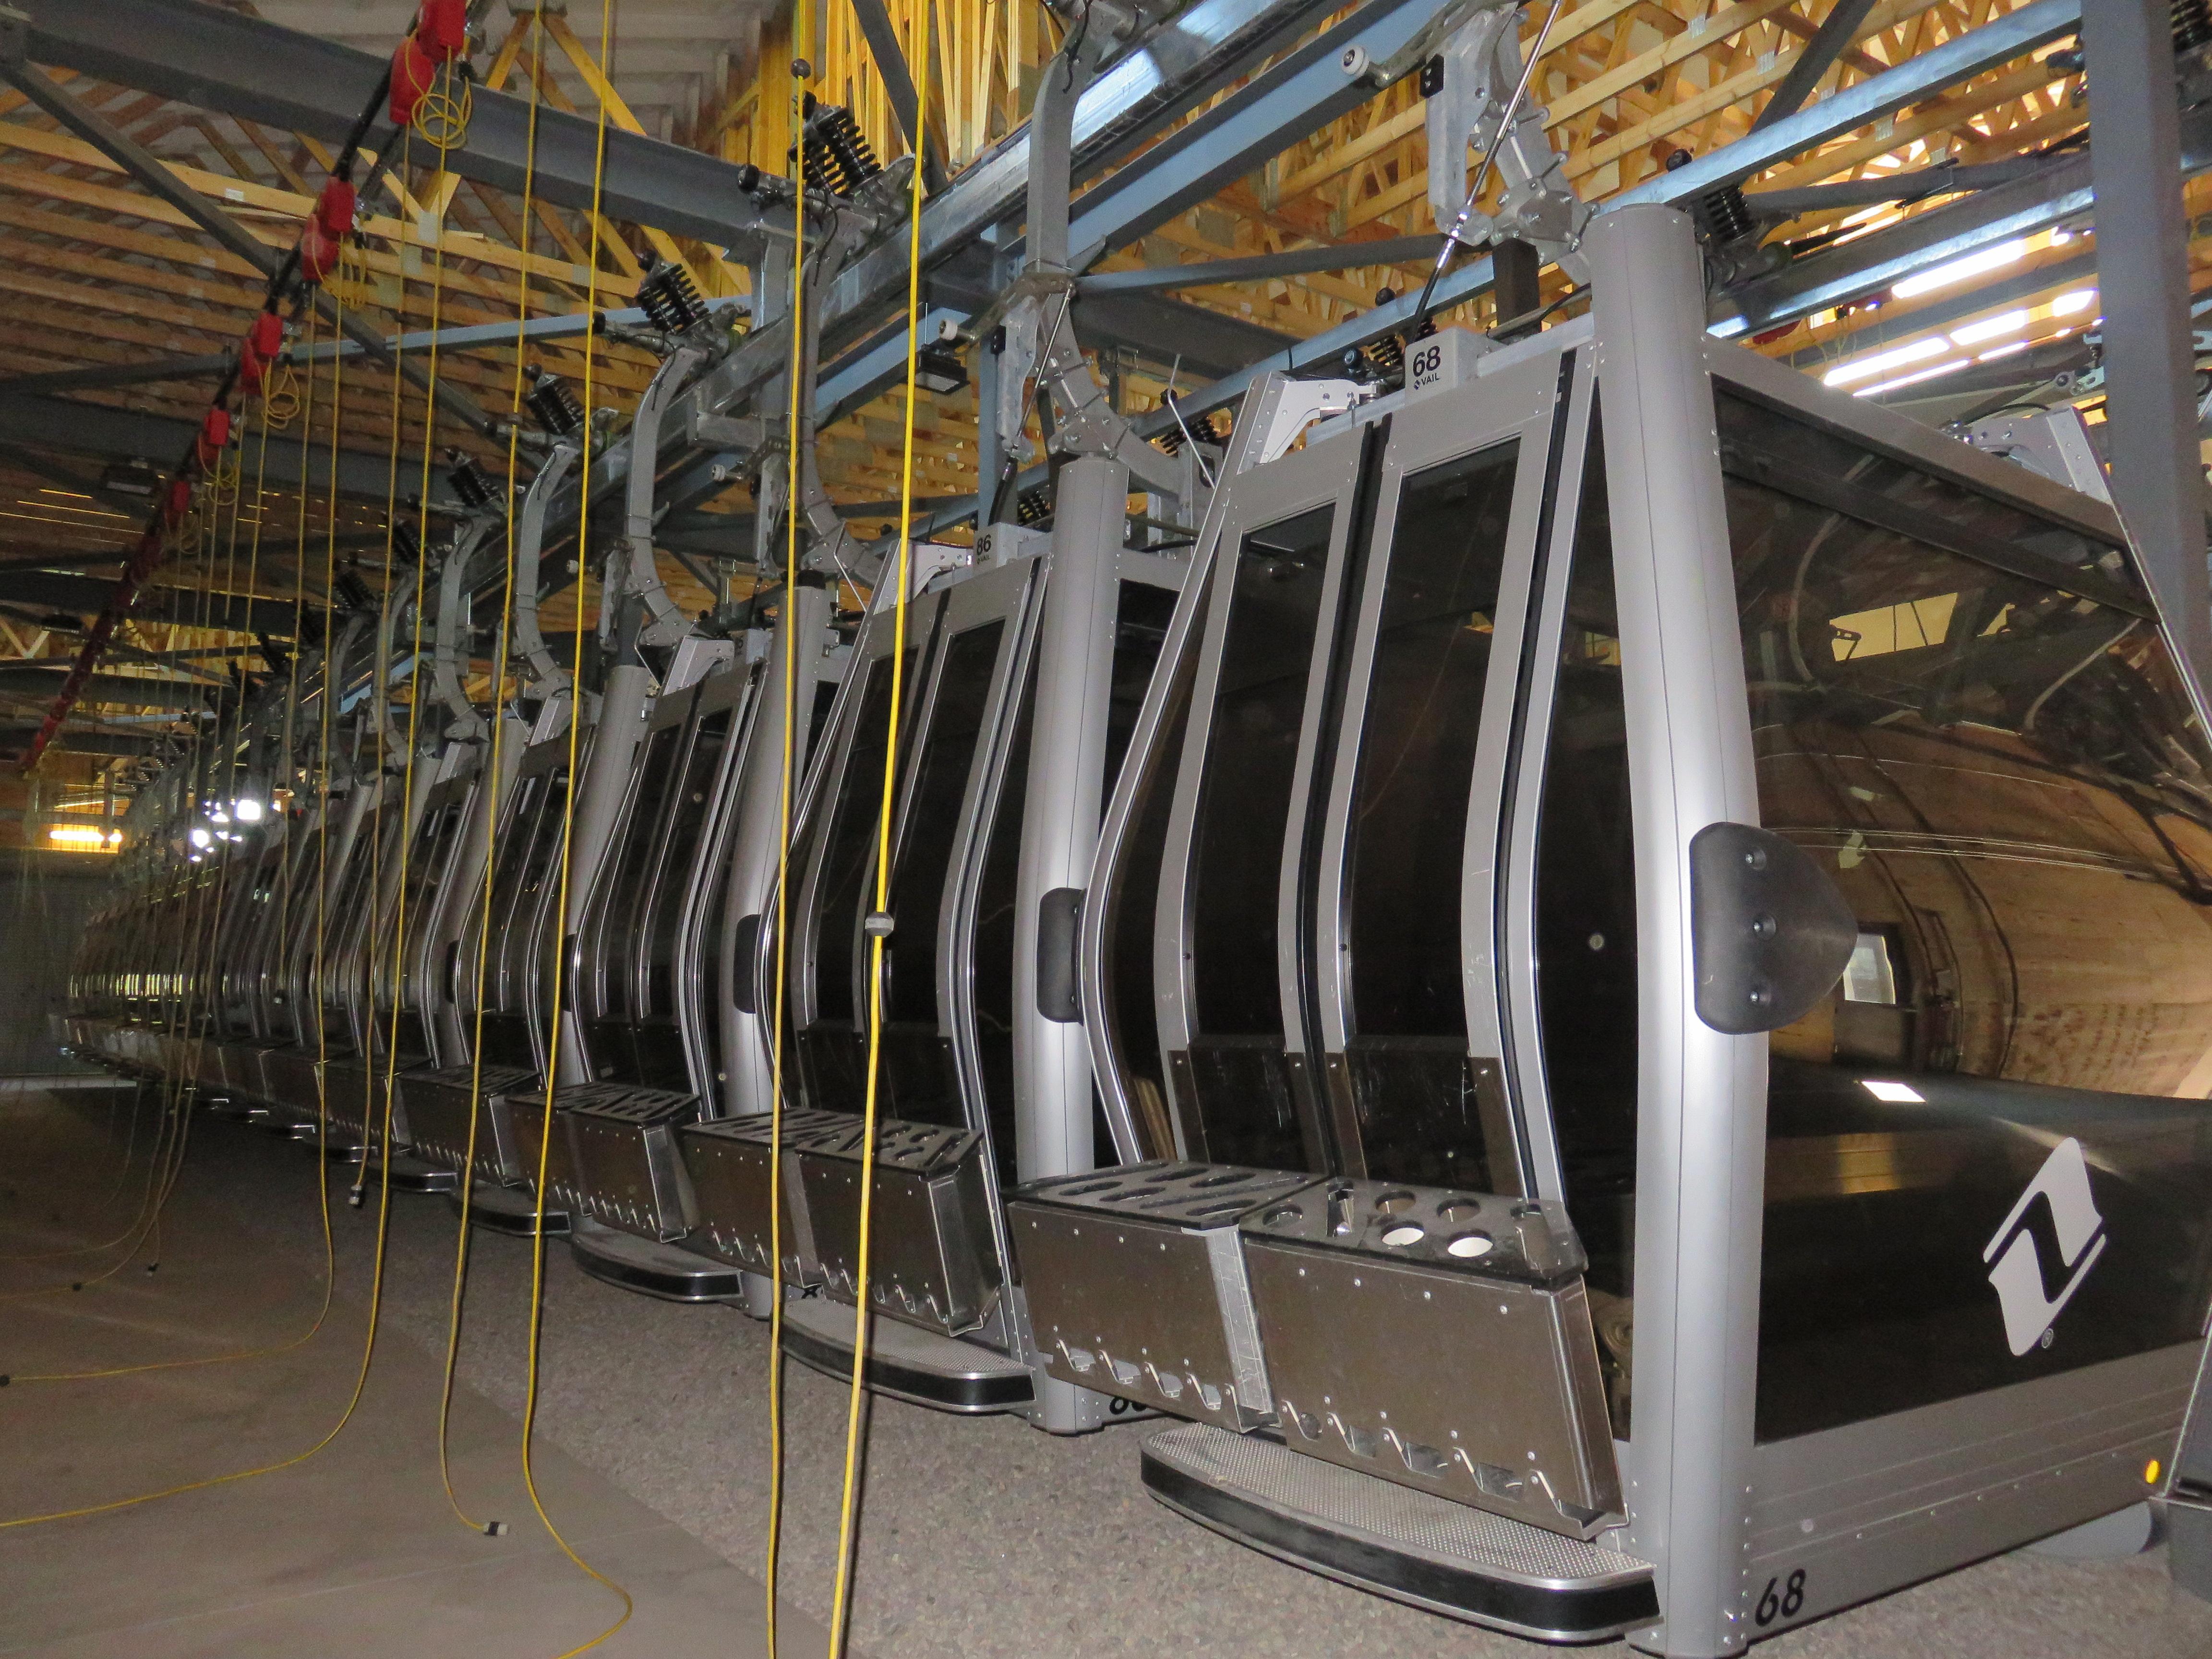 Lift profile vail s gondola one lift blog for Jackson wyoming alloggio cabine